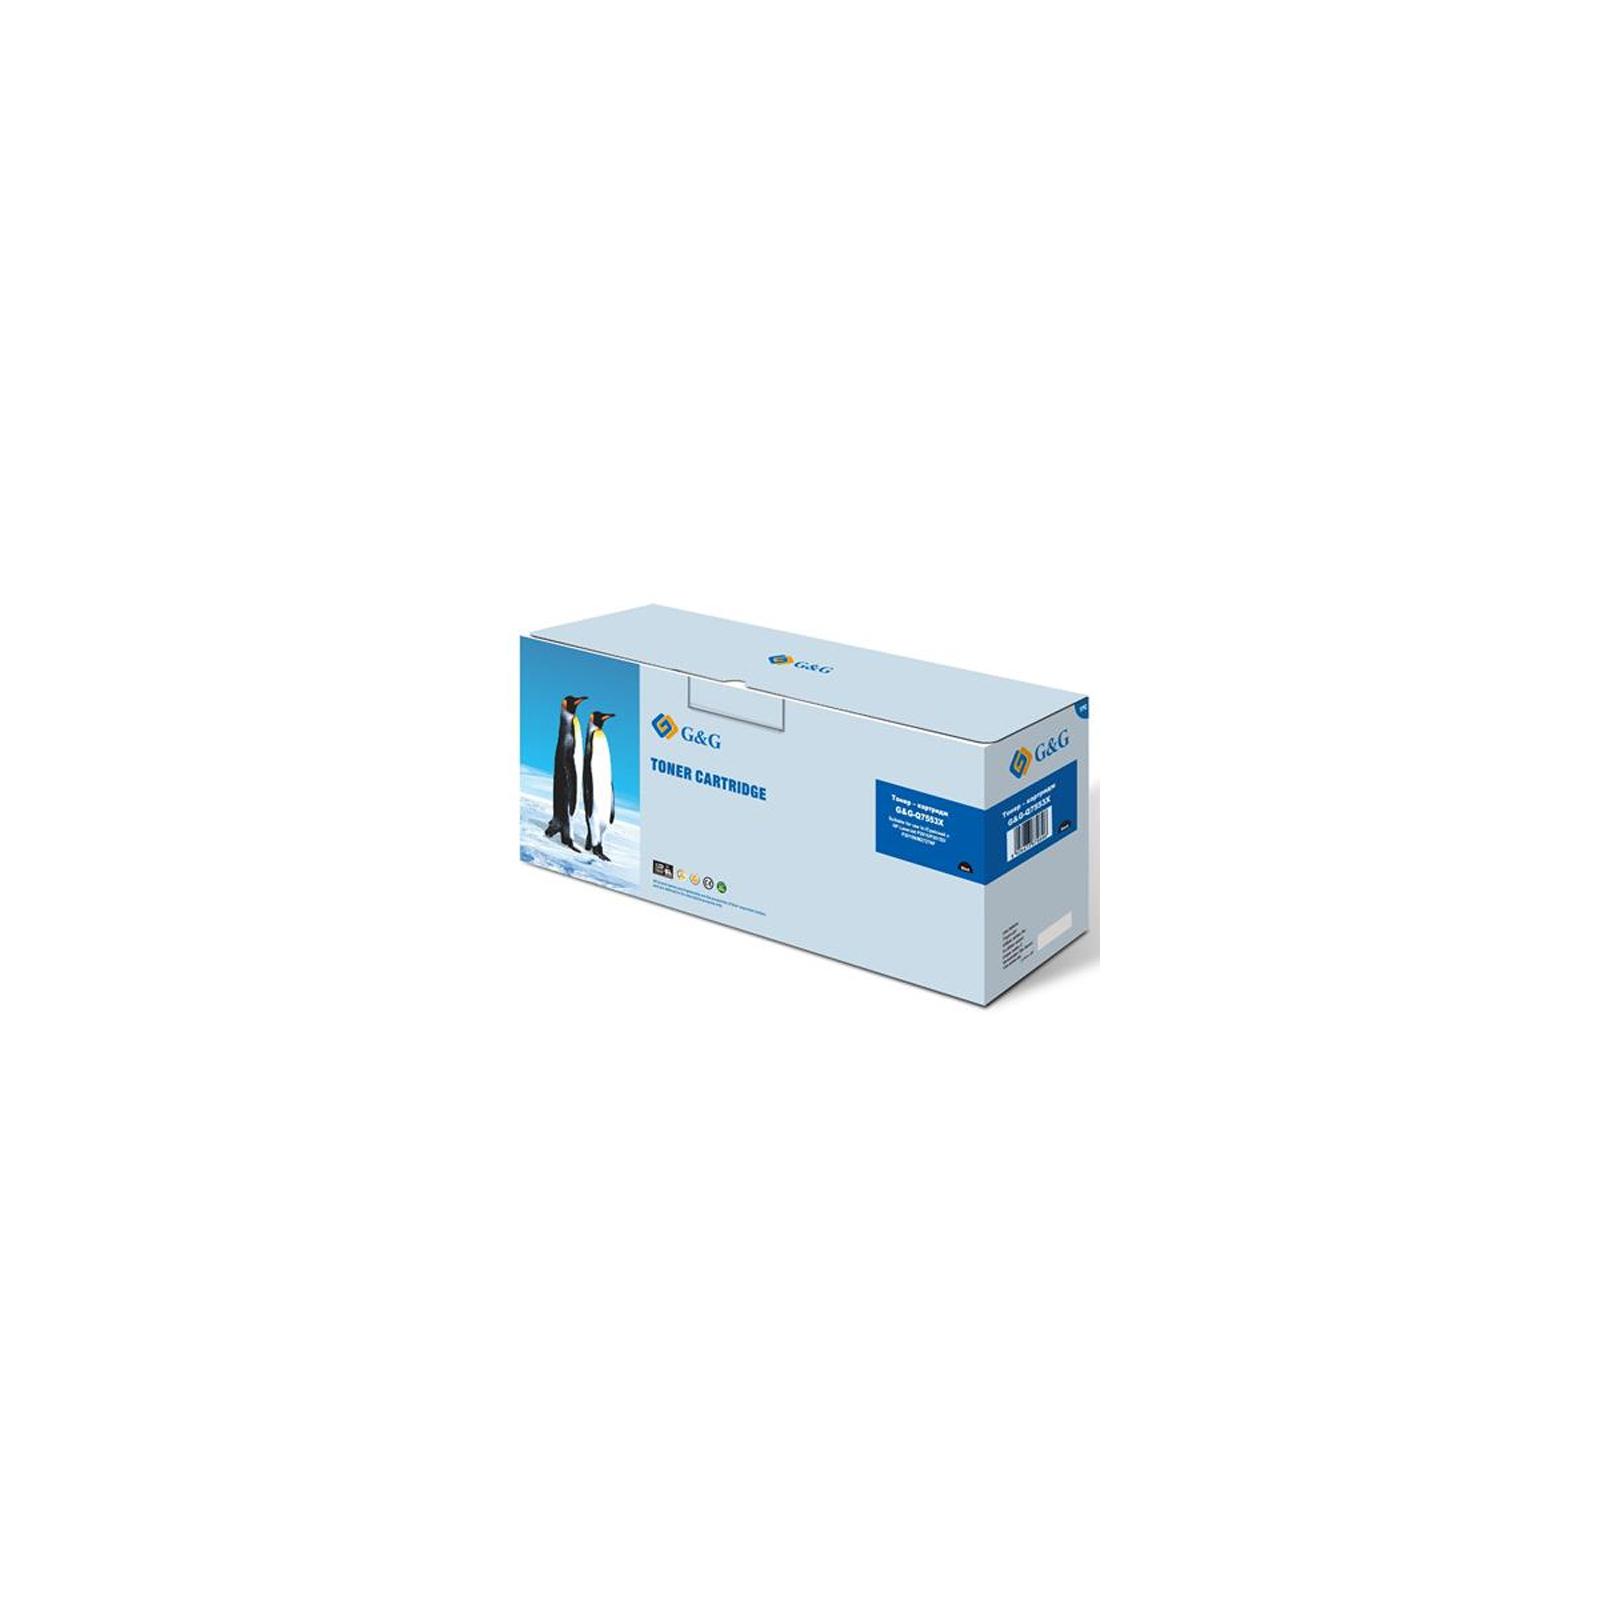 Картридж G&G для HP LJ P2014/P2015 series, LJ M2727nf series (max) Black (G&G-Q7553X)